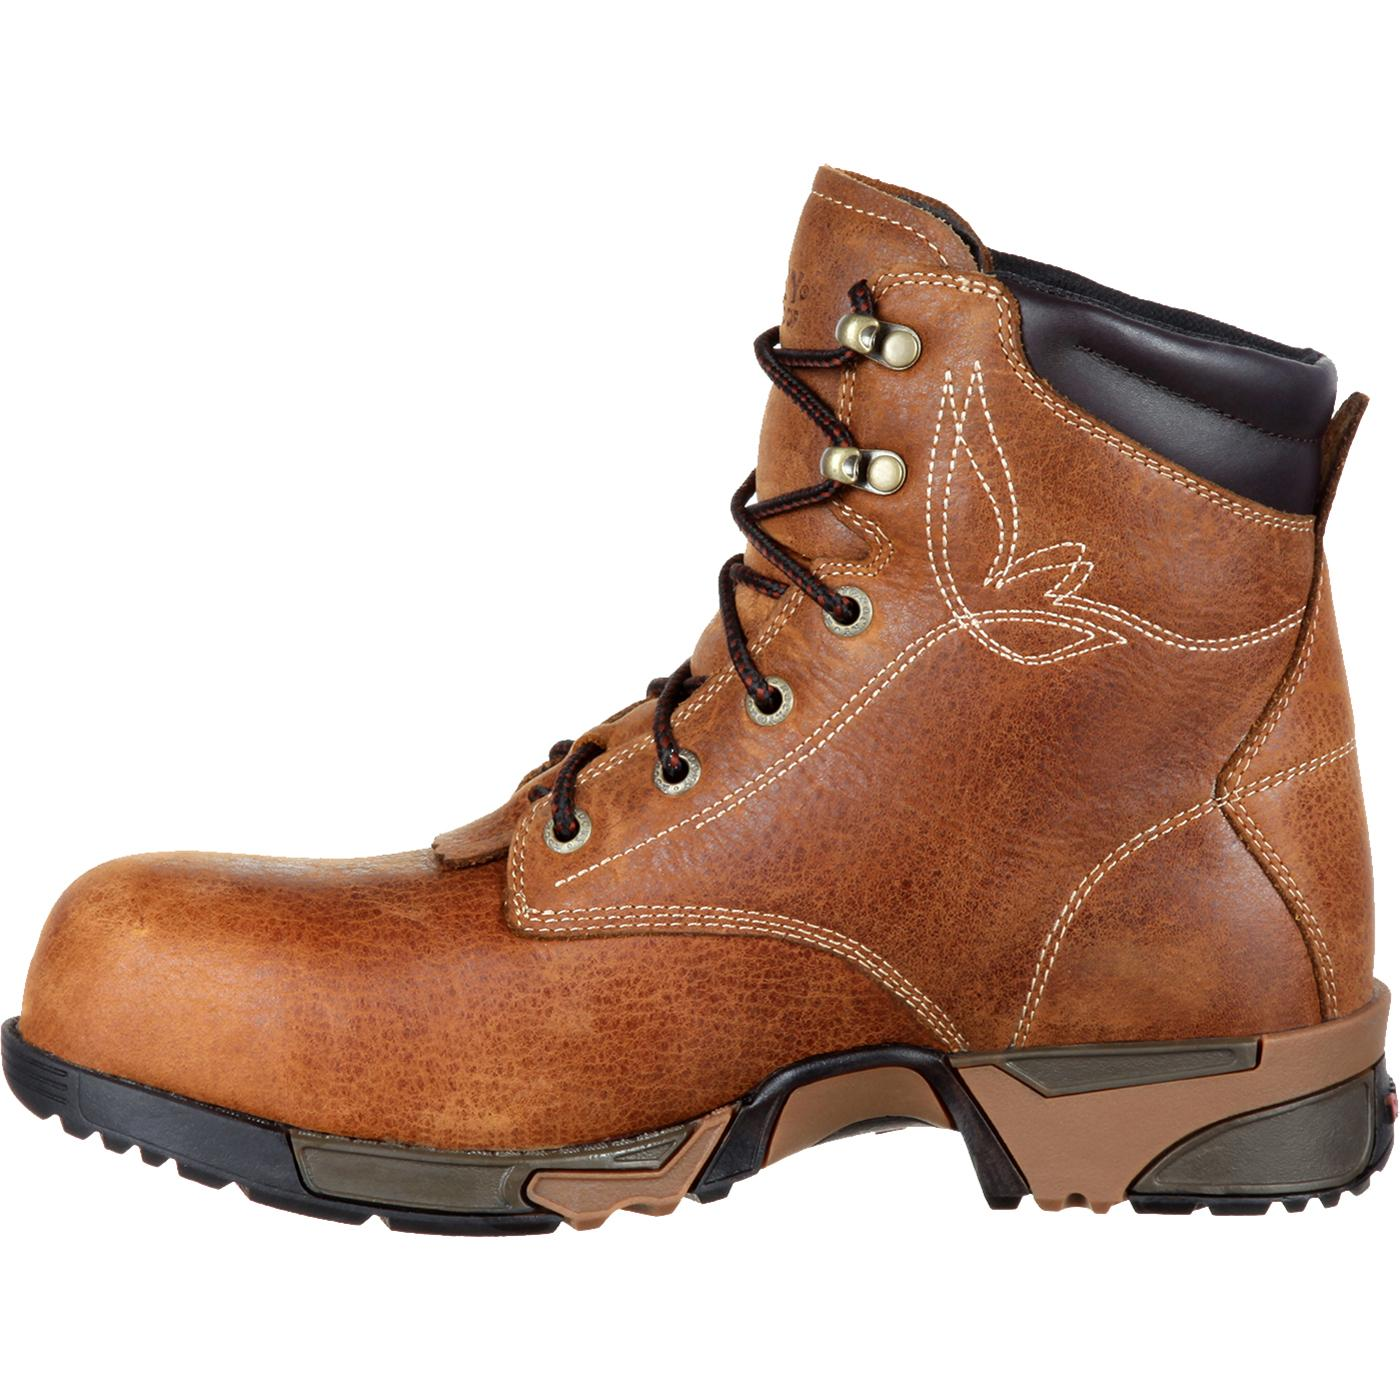 8173239619e Rocky Aztec Women's Composite Toe Waterproof Lace-up Work Boot